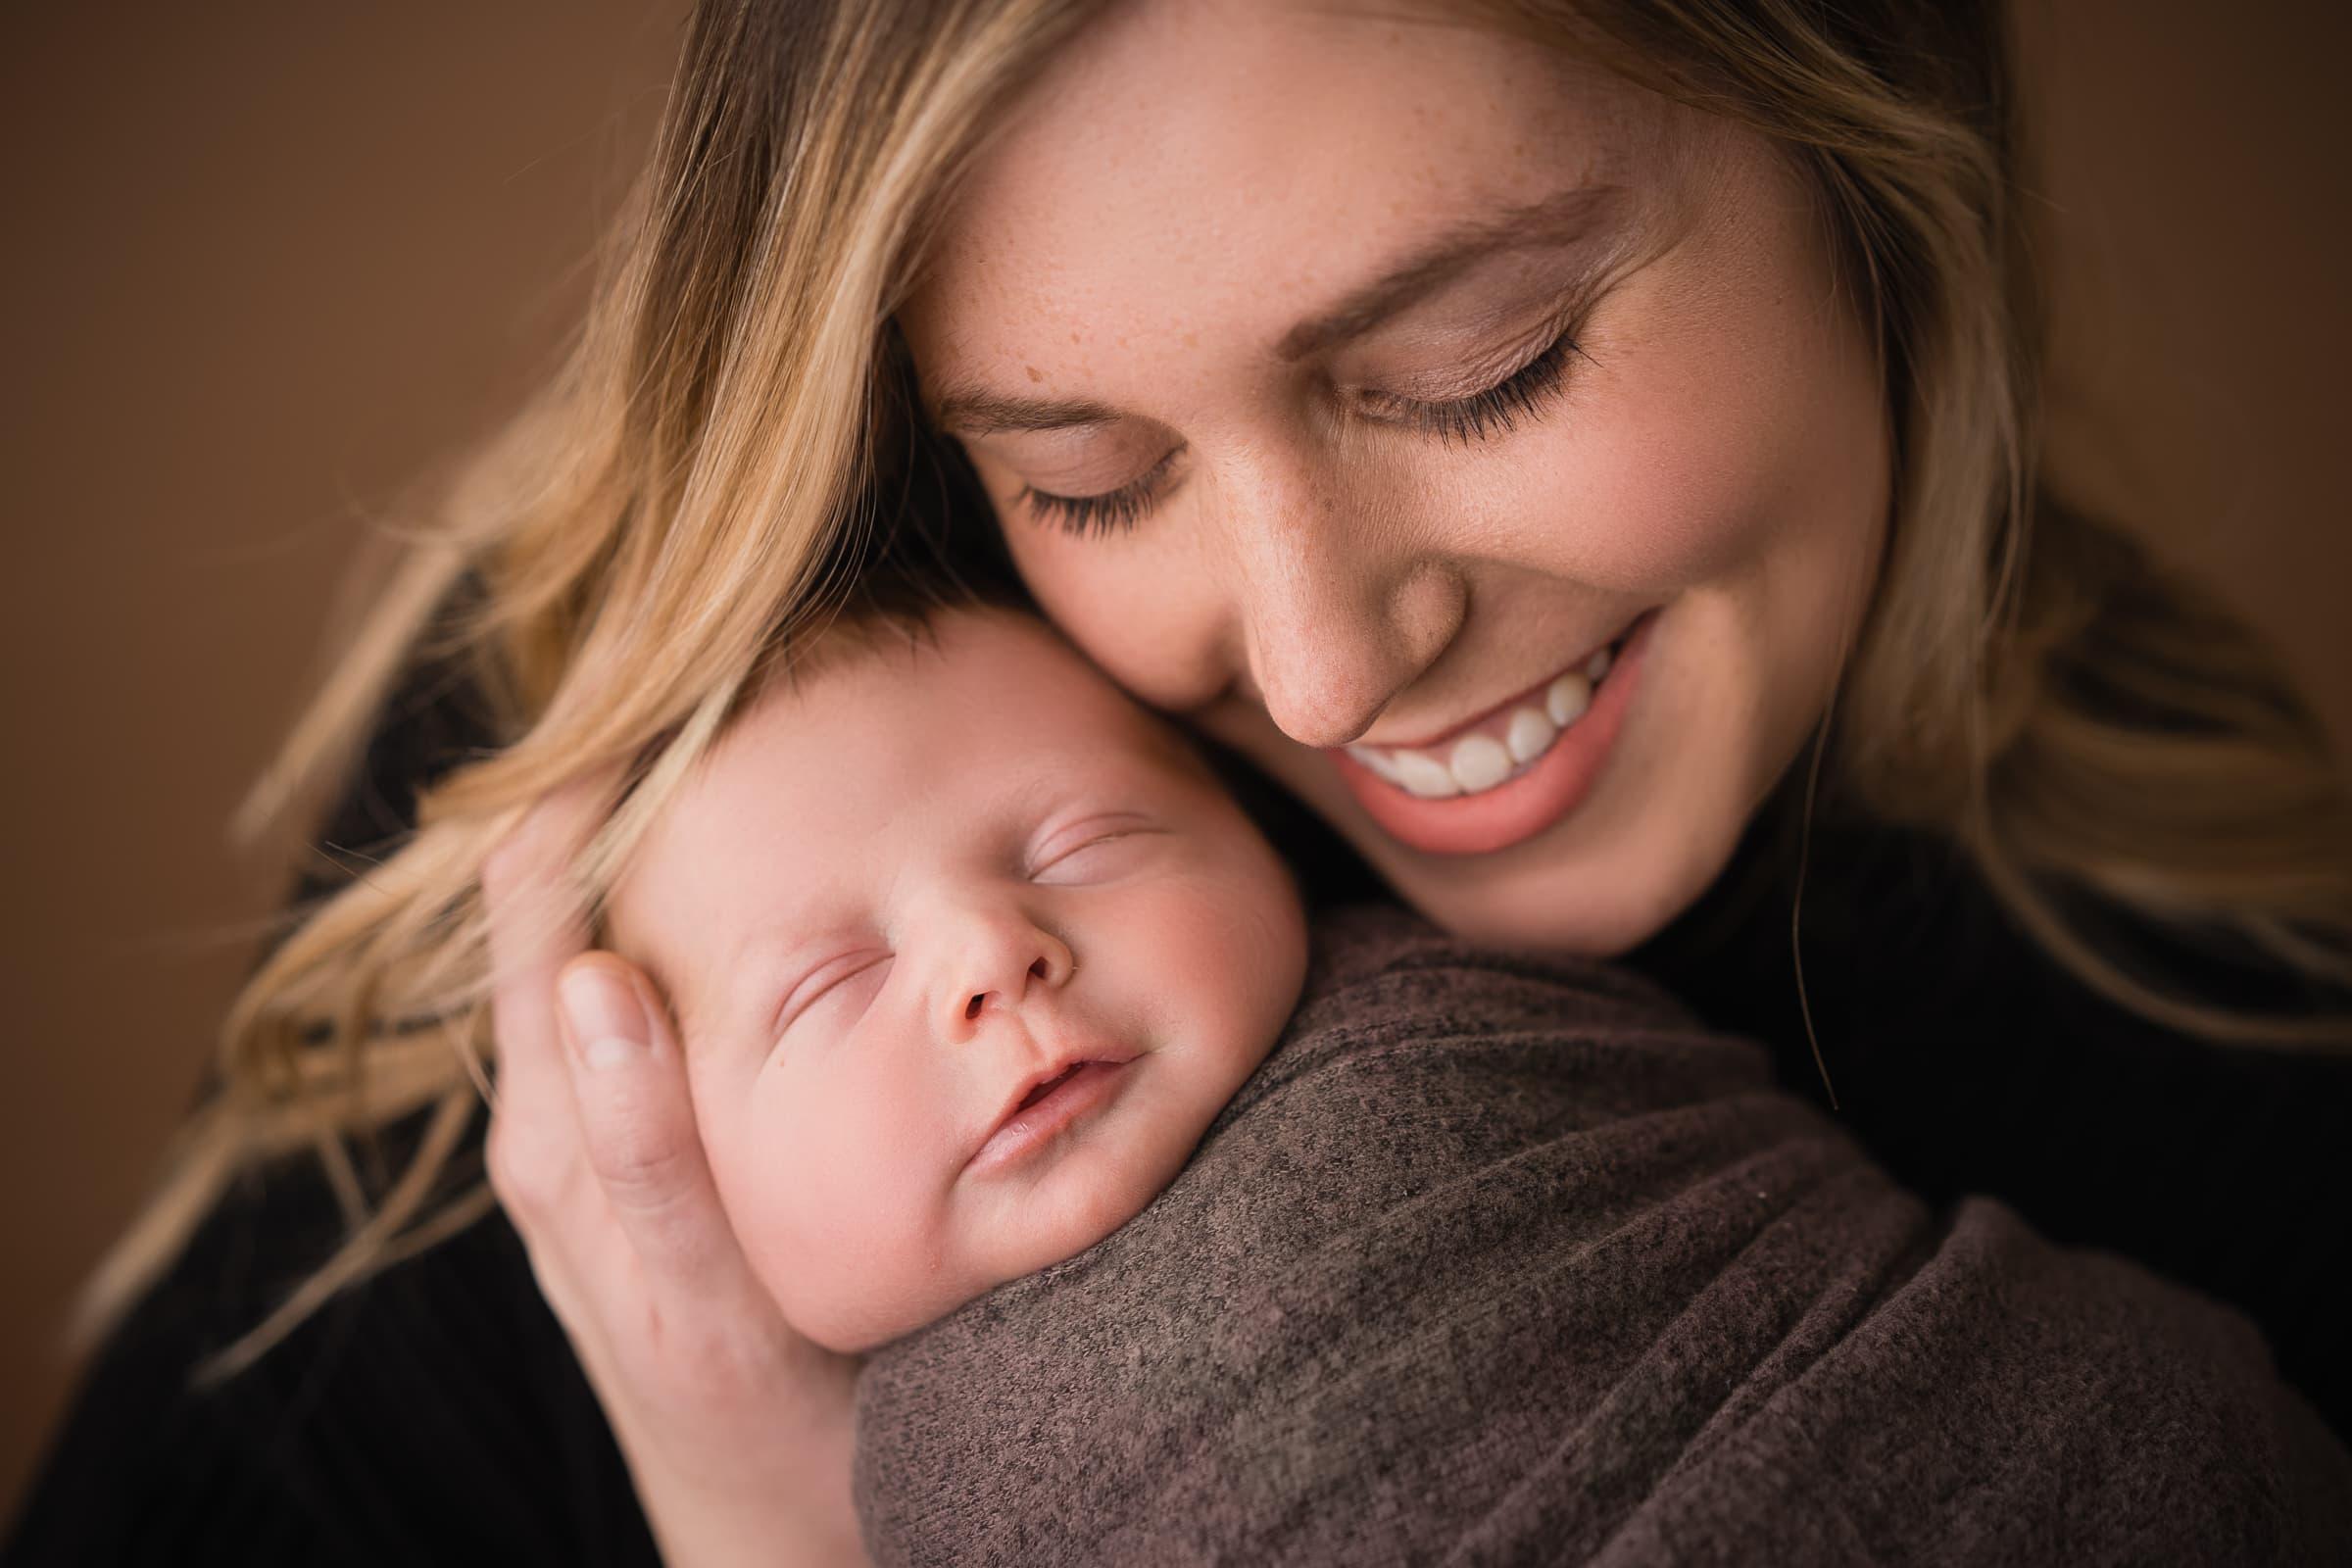 barrett newborn pictures 31